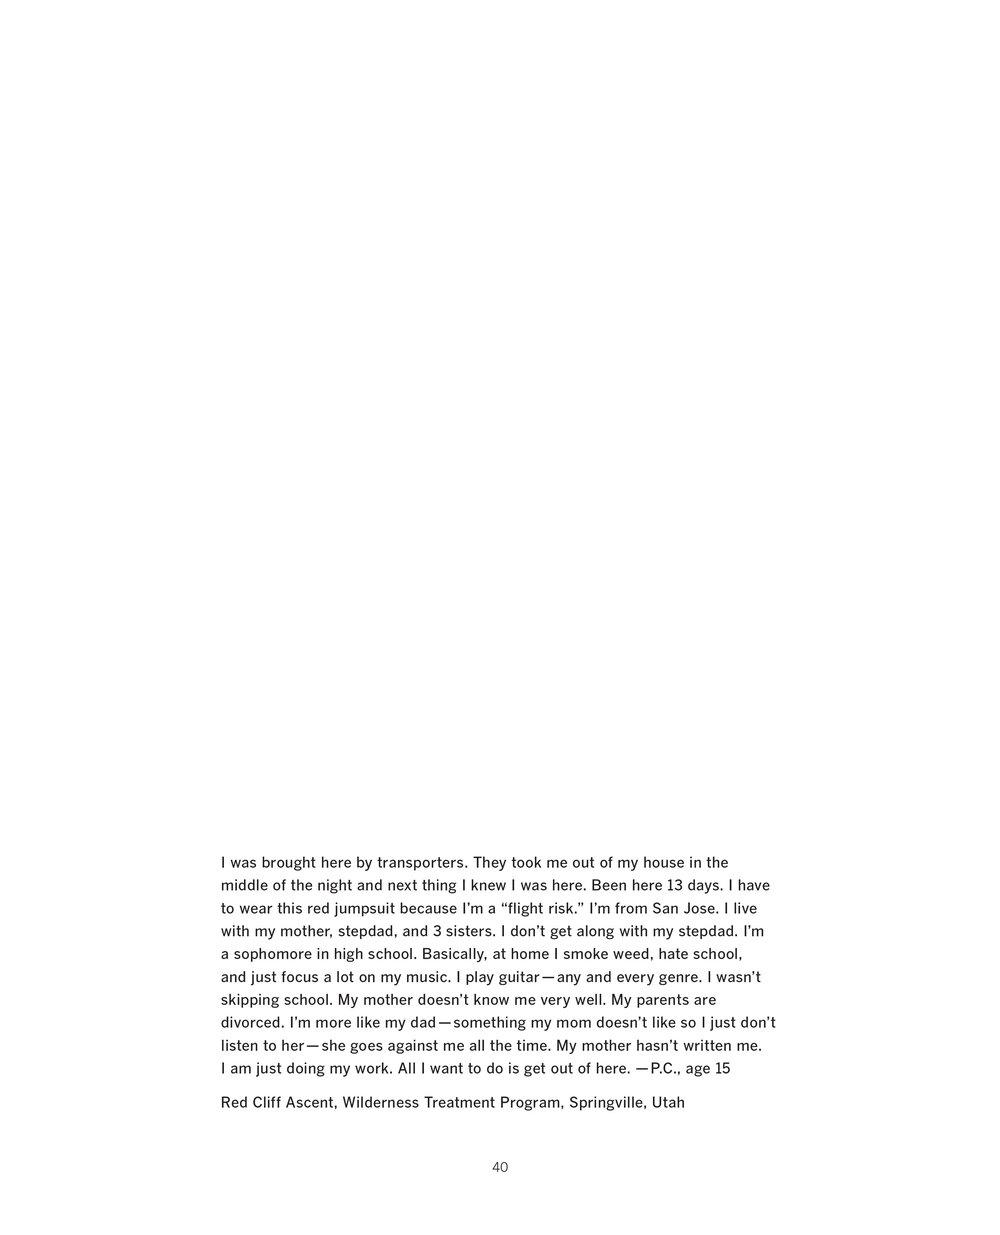 JiJ-Digital_Edition_Page_035_Image_0001.jpg